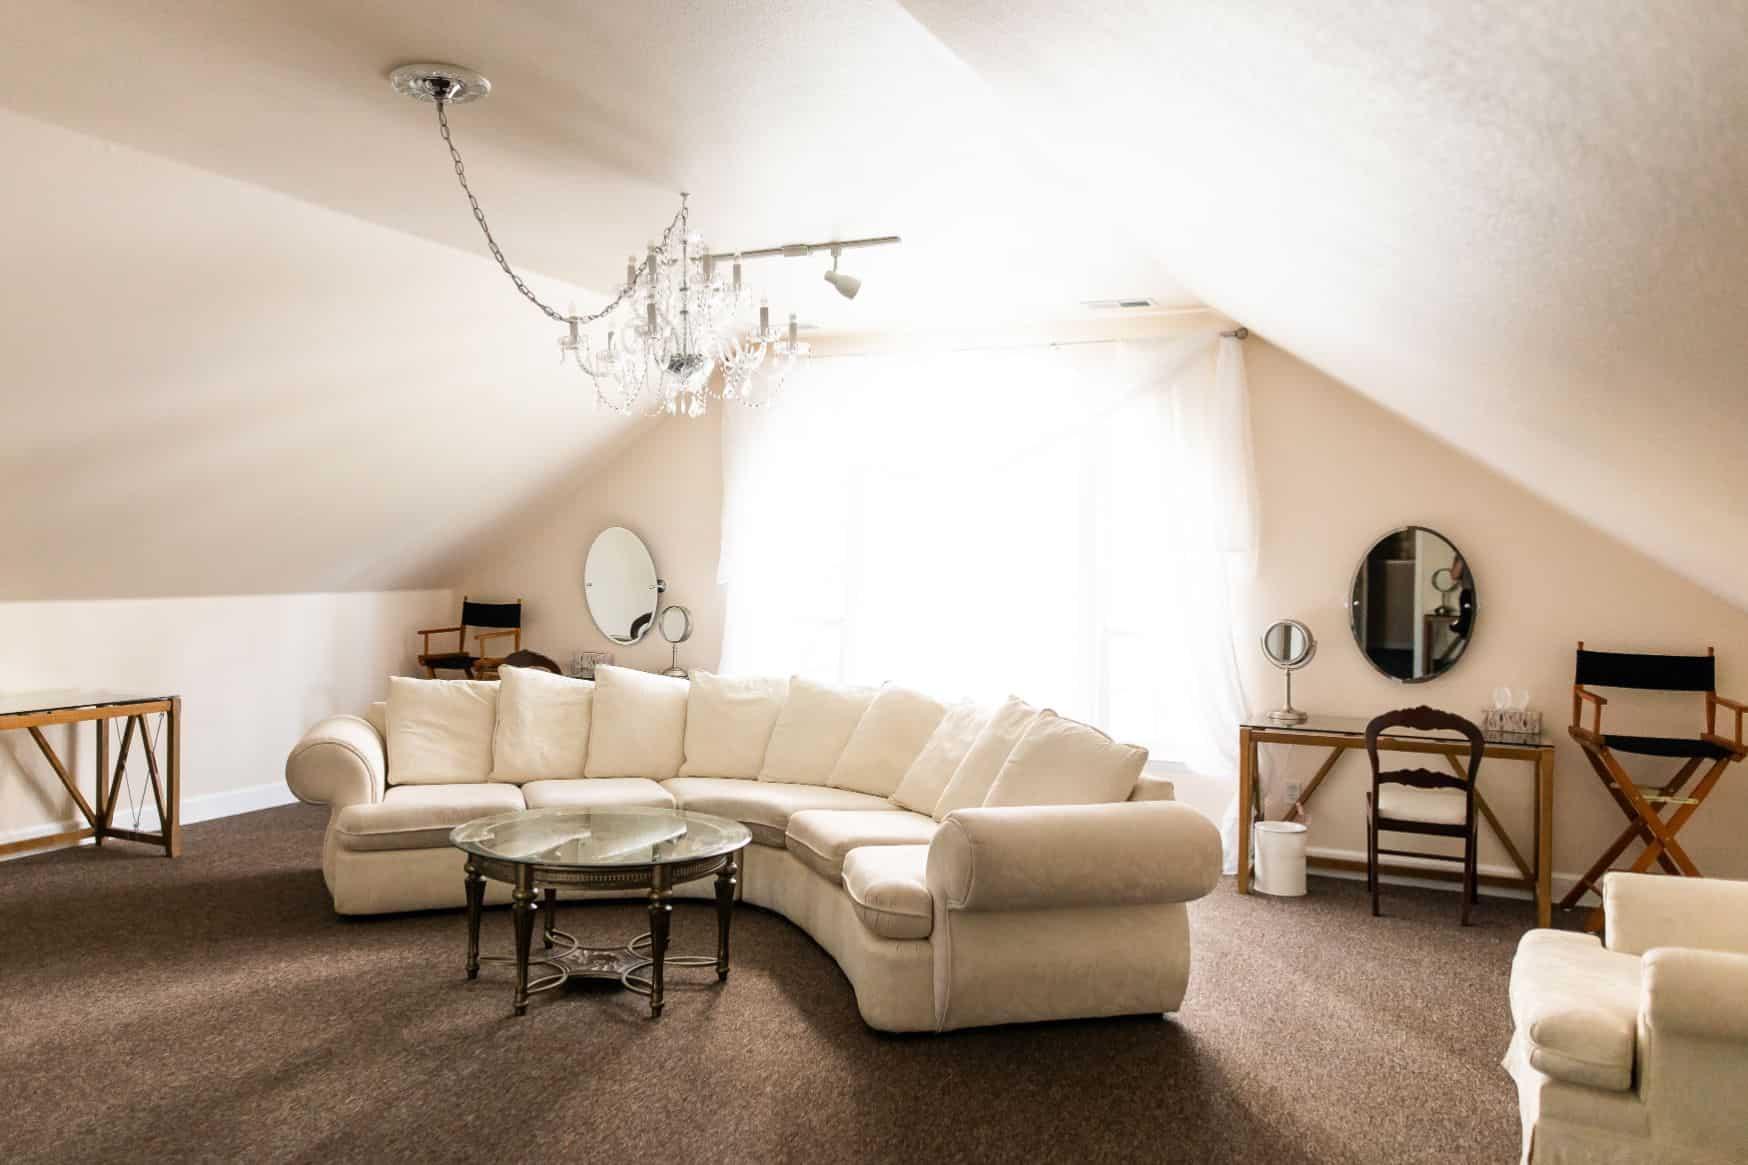 000 hangout bridal suite rustic mountain house estate wedding venues northern california